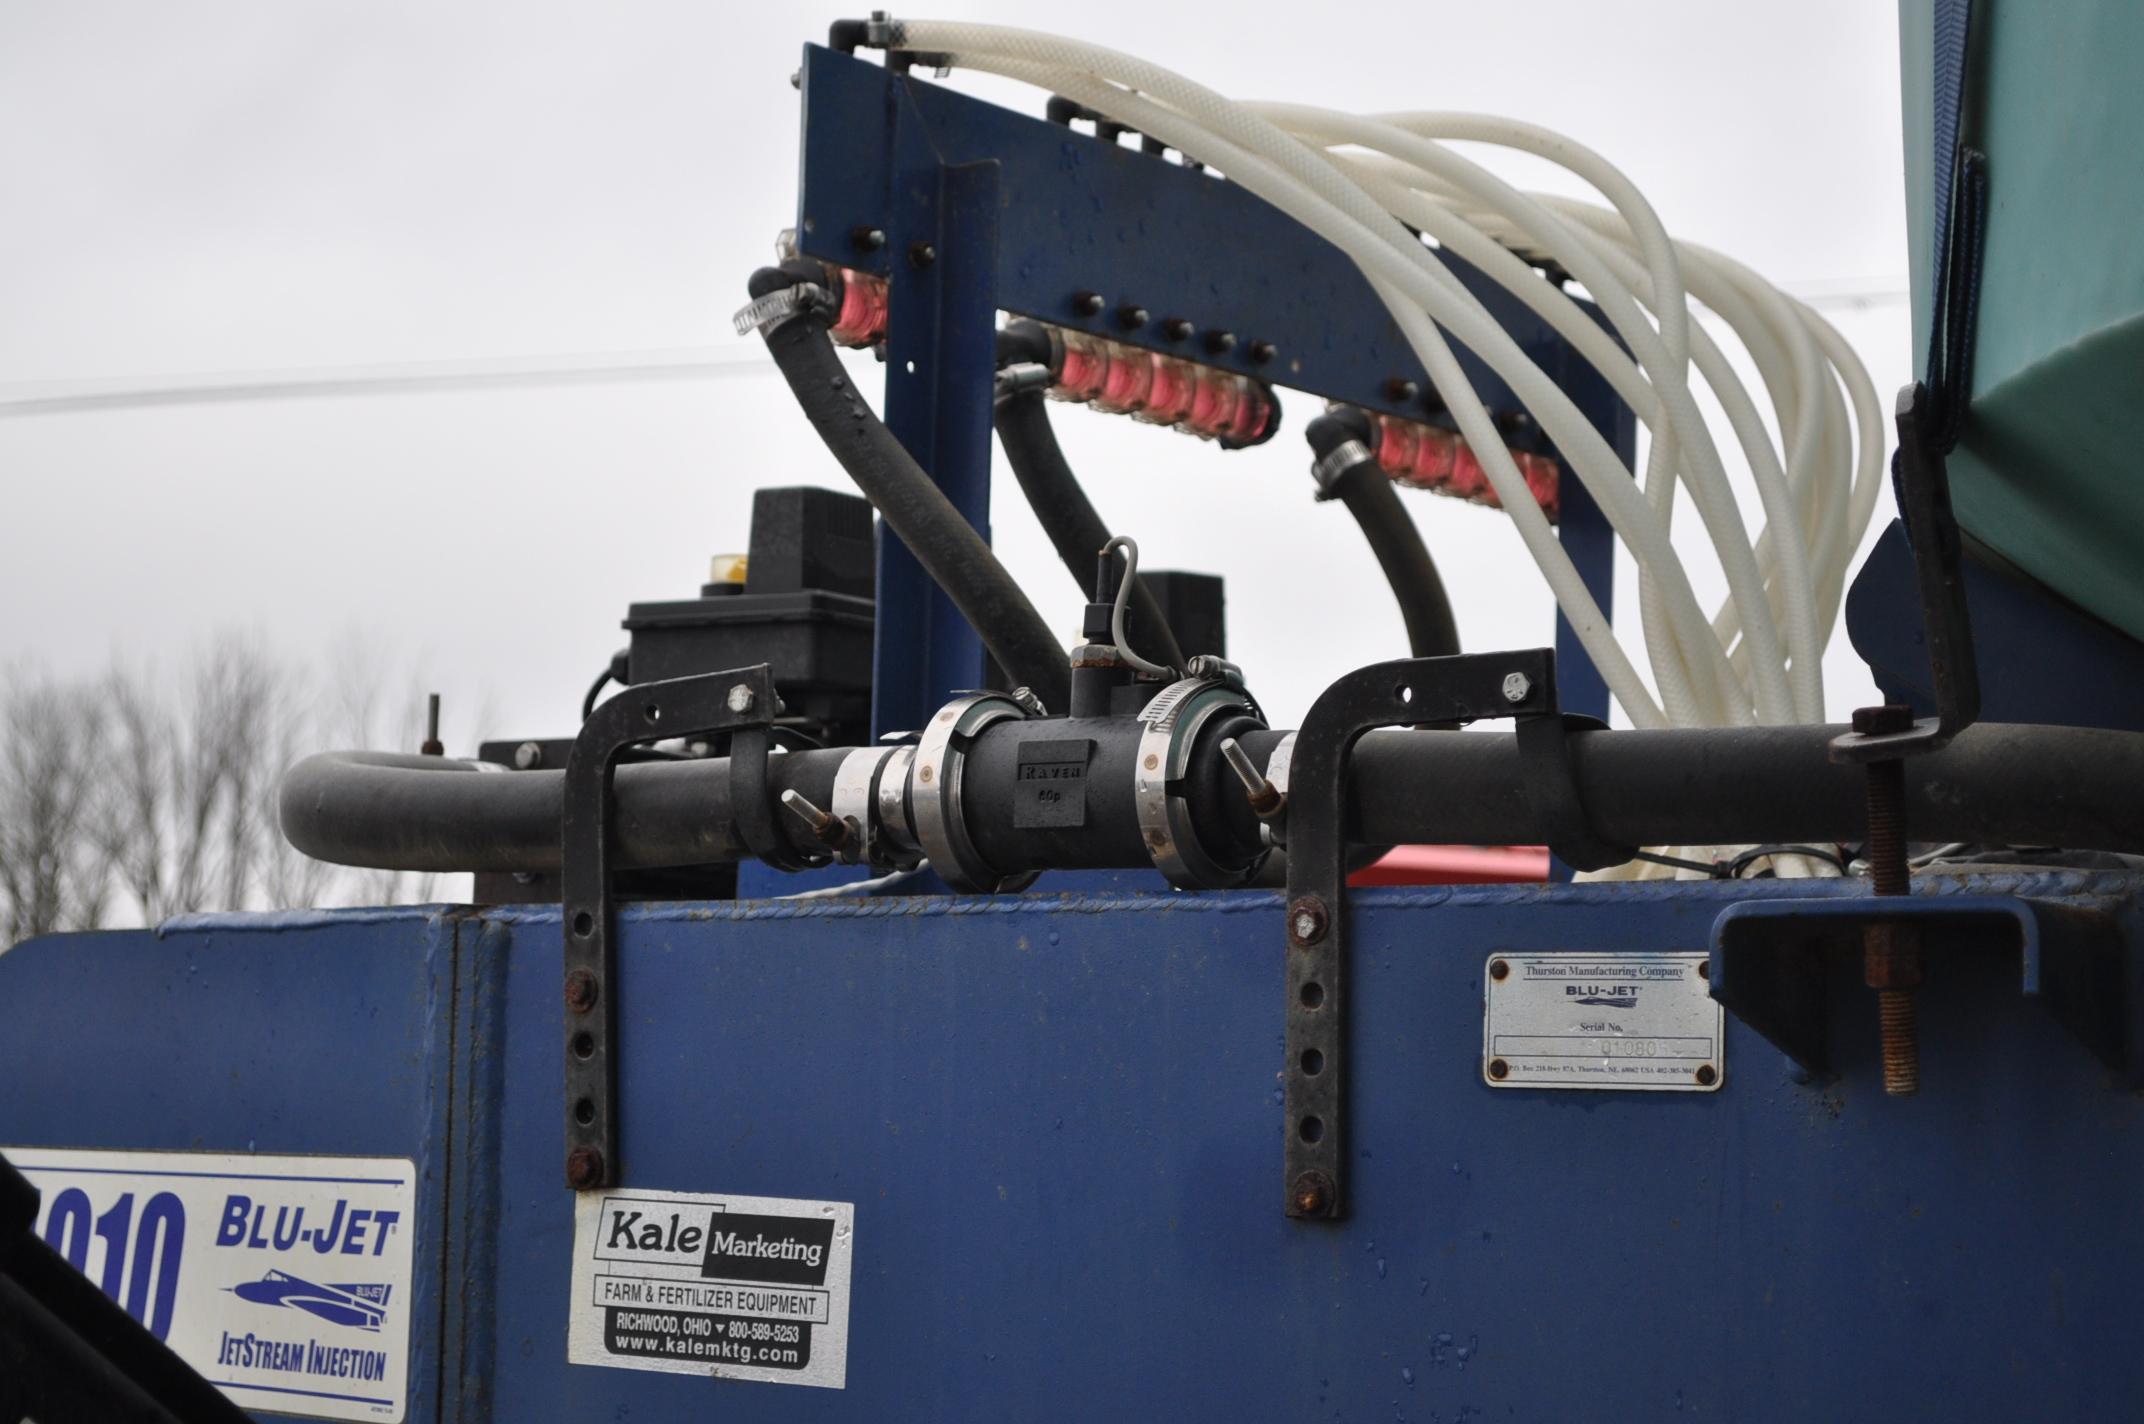 Blu-Jet AT 4010 28% applicator, 12/16 row, 1200 gal poly tank, 320/90R46 tires, hyd drive pump, - Image 8 of 12